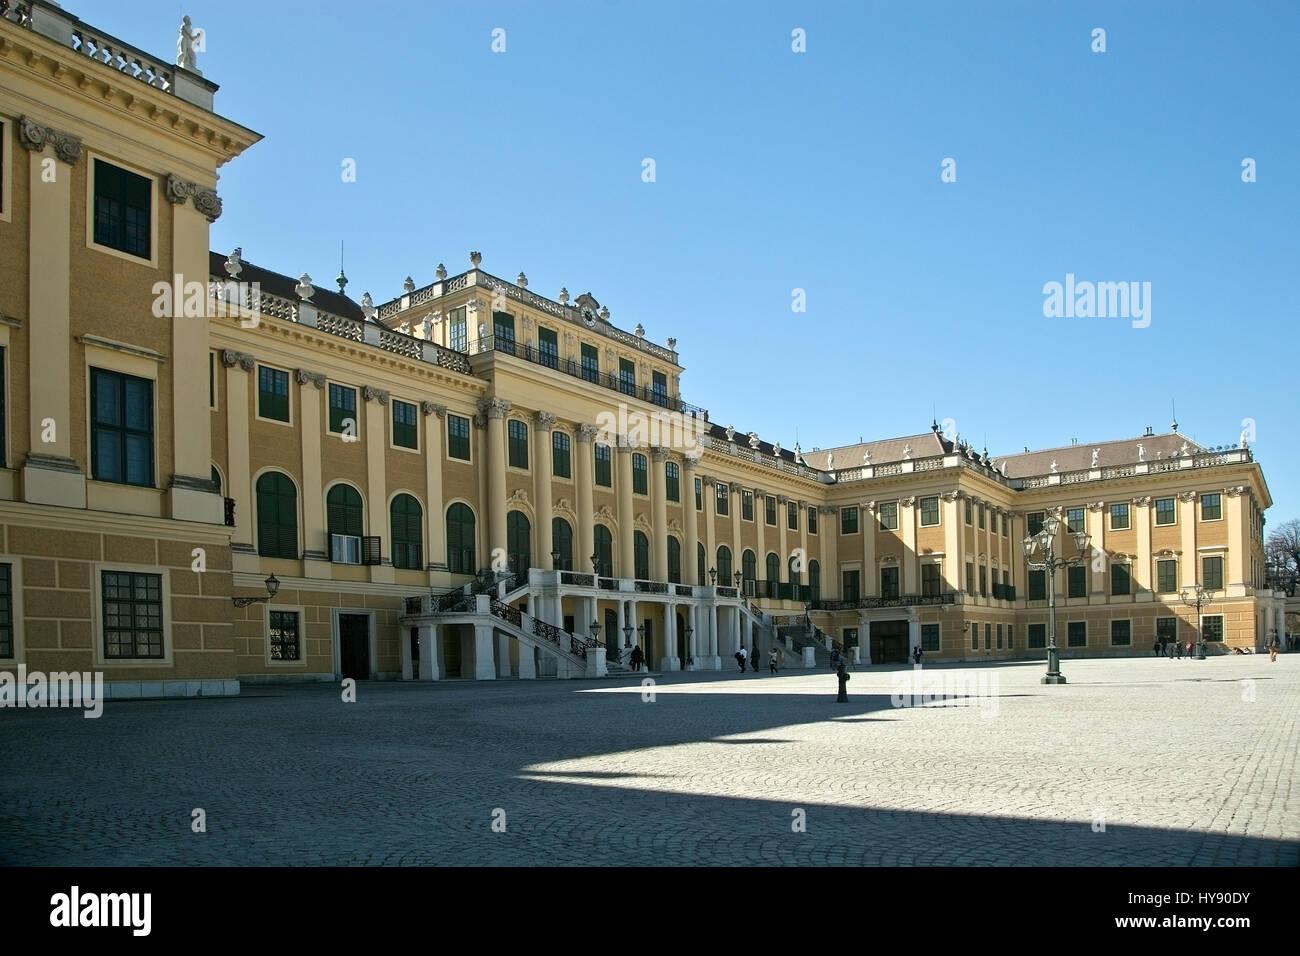 Palacio de Schonbrunn, Viena. Imagen De Stock